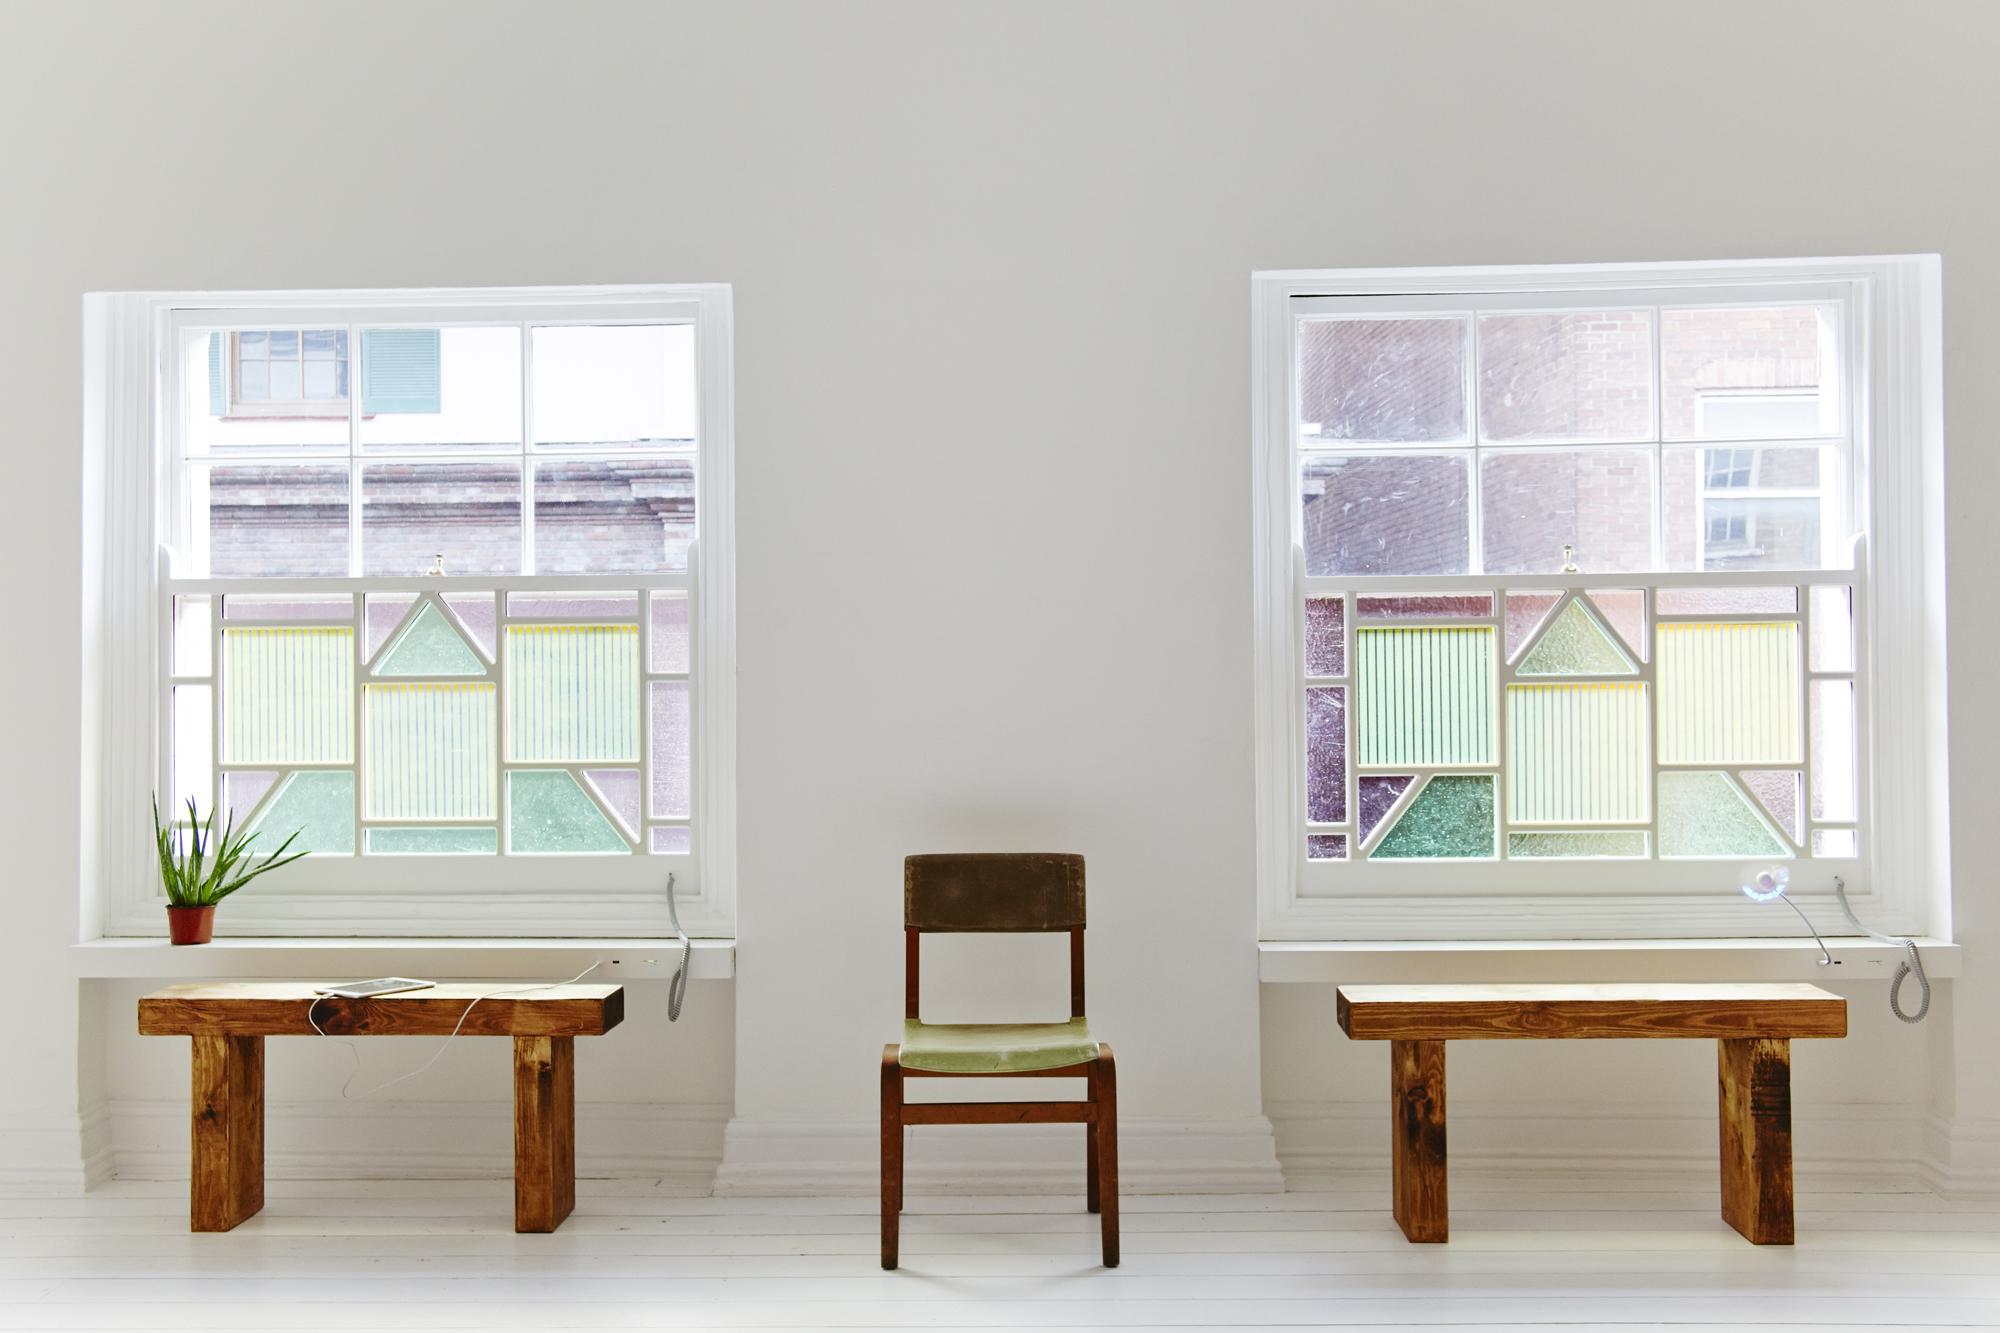 1 Current Window - Amy Gwatkin3.jpg